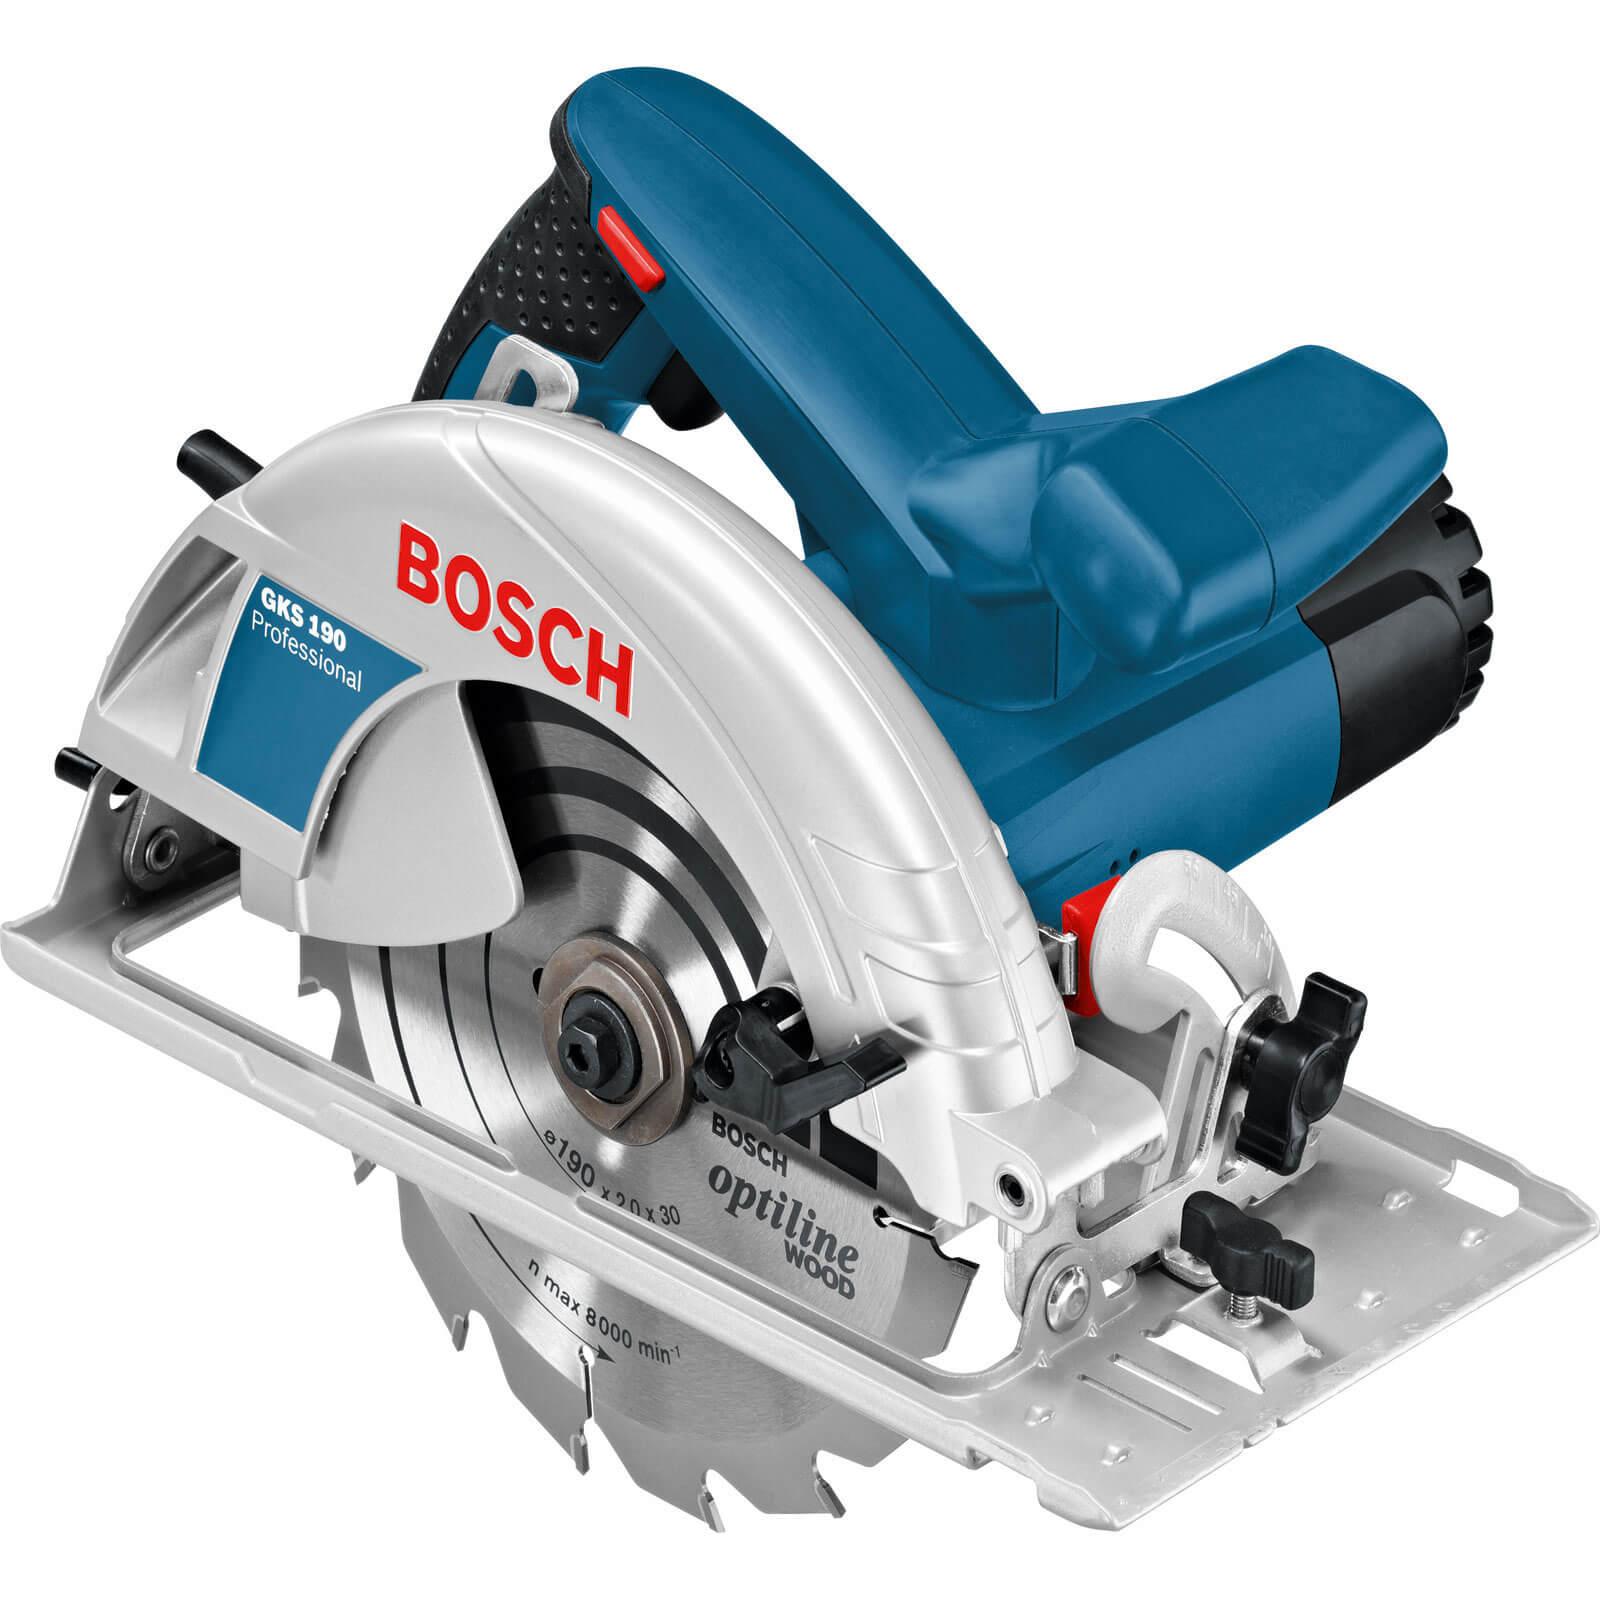 Bosch GKS 190 Circular Saw 240V